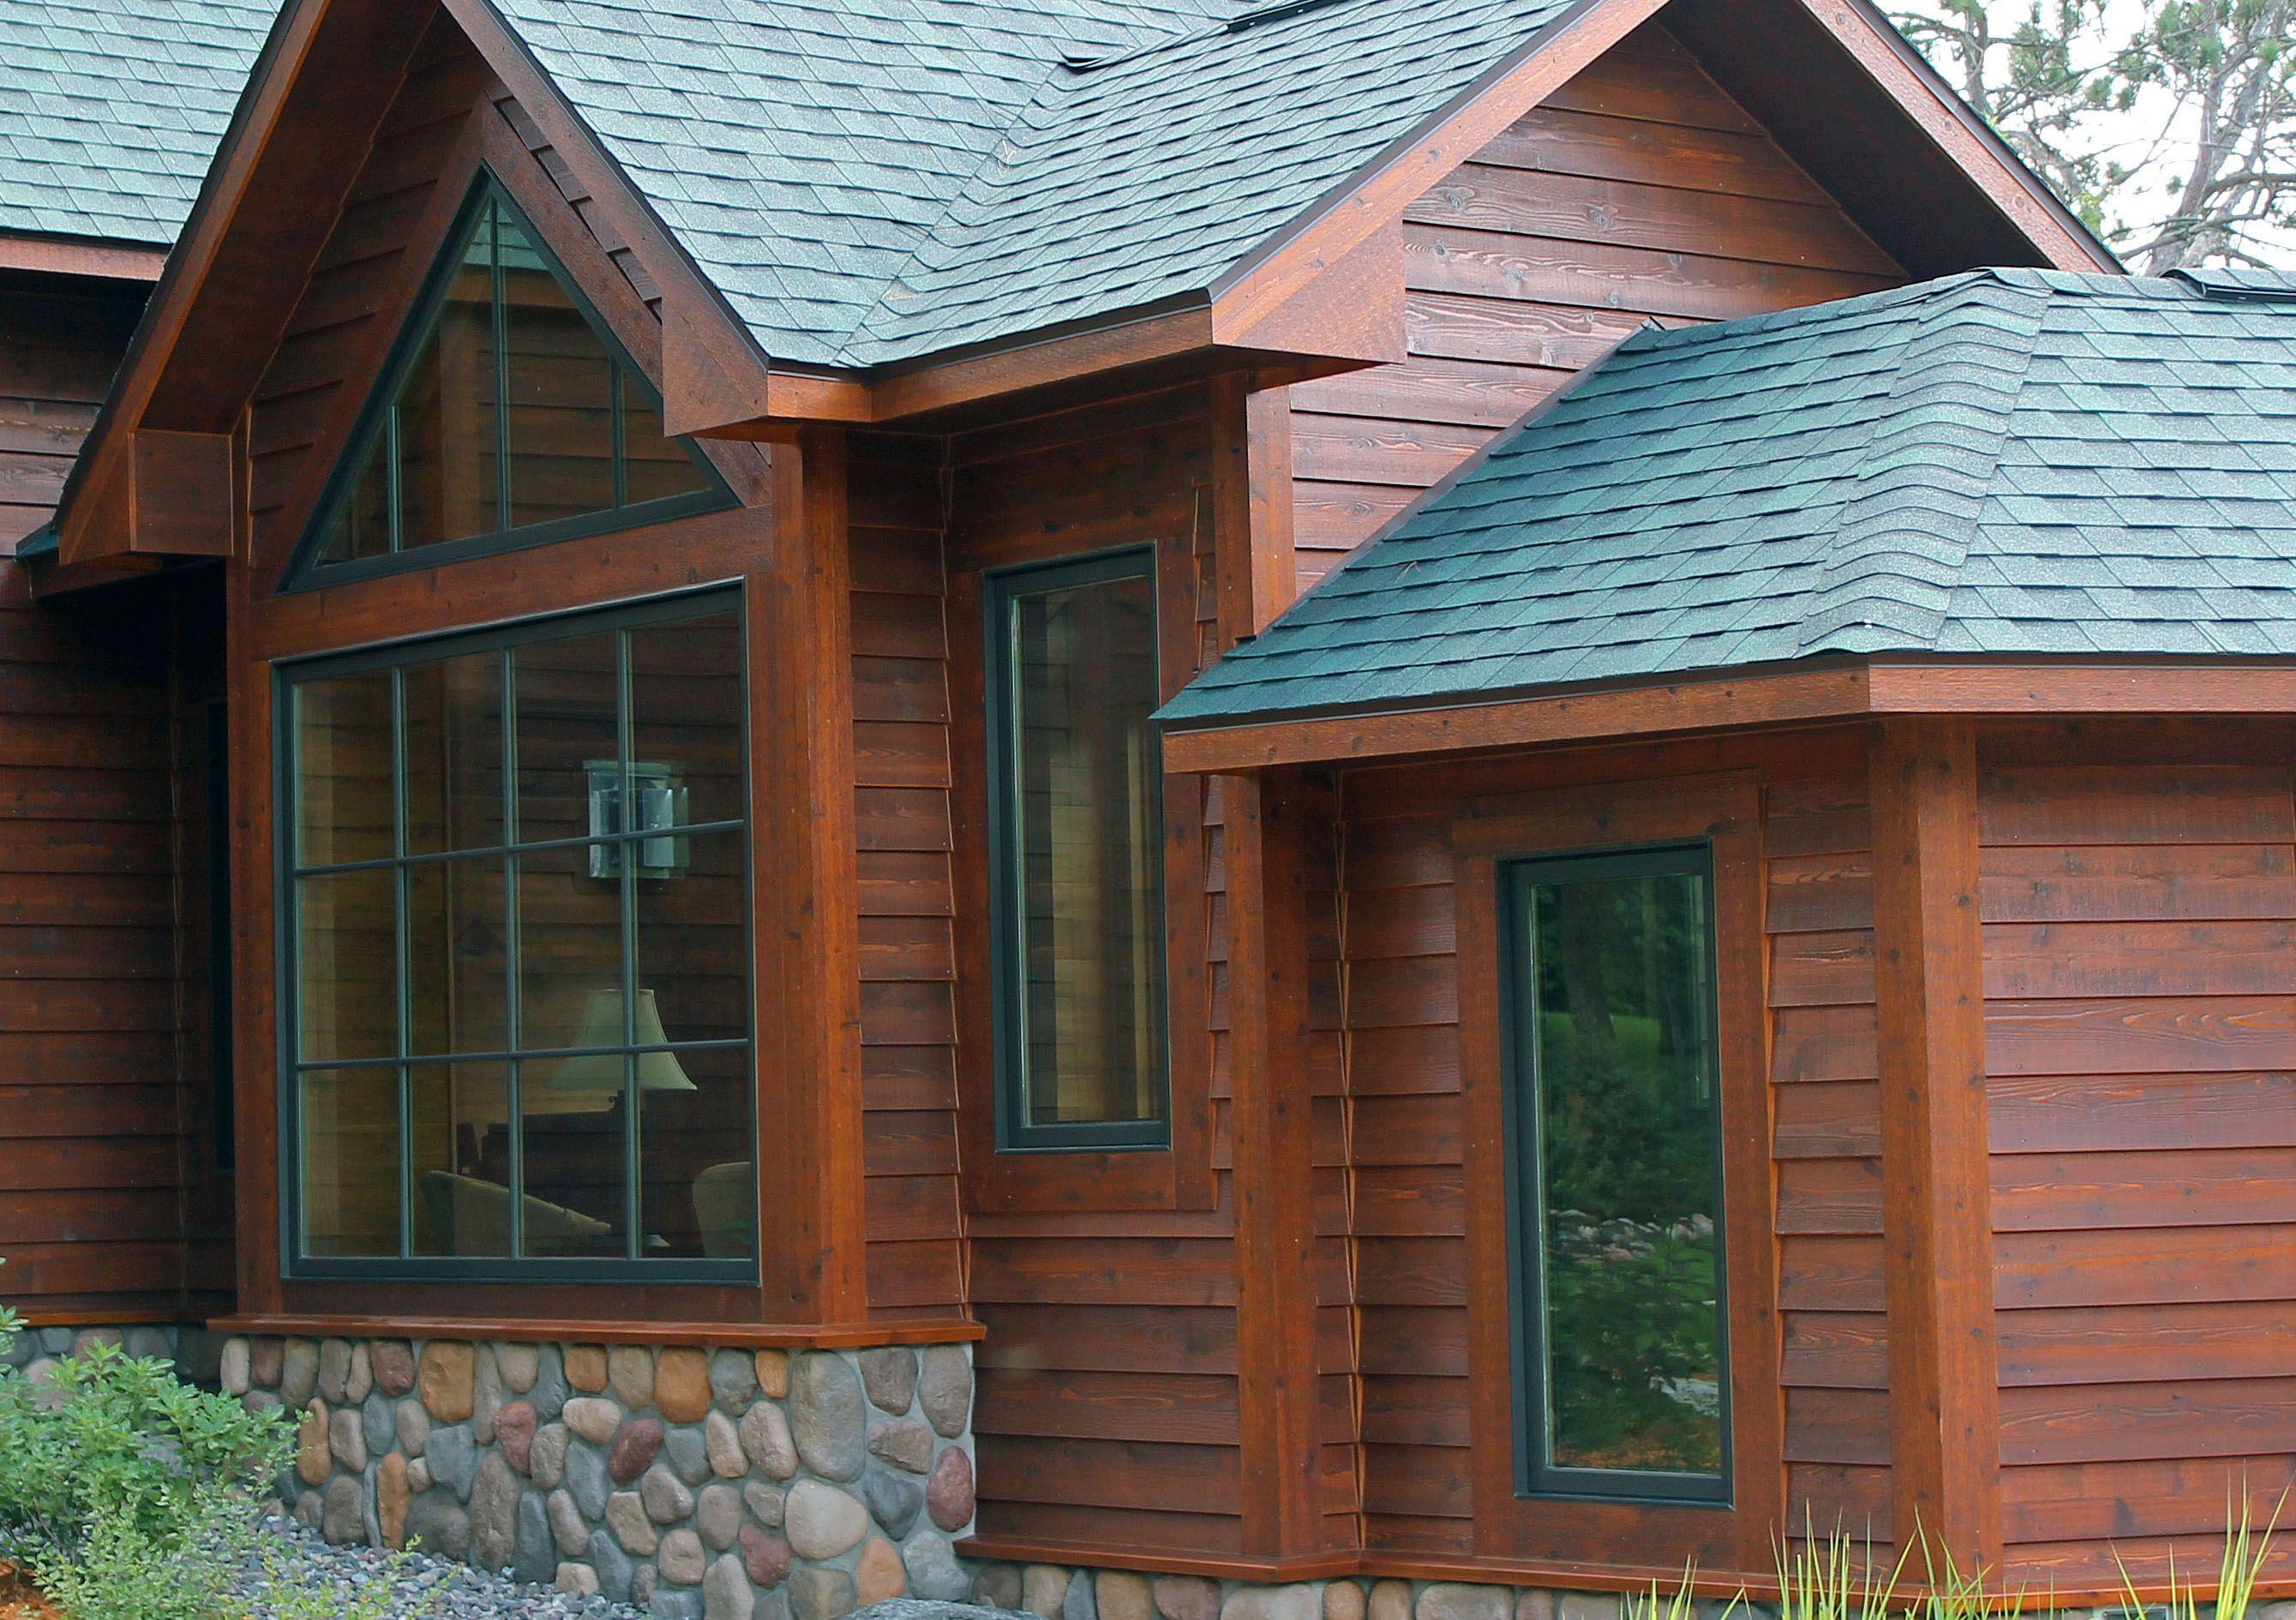 5 4 8 Tight Knot Cedar Rabbeted Bevel Sikkens L S 077 Cedar 085 Teak Cedar Stain Wood Siding House Styles